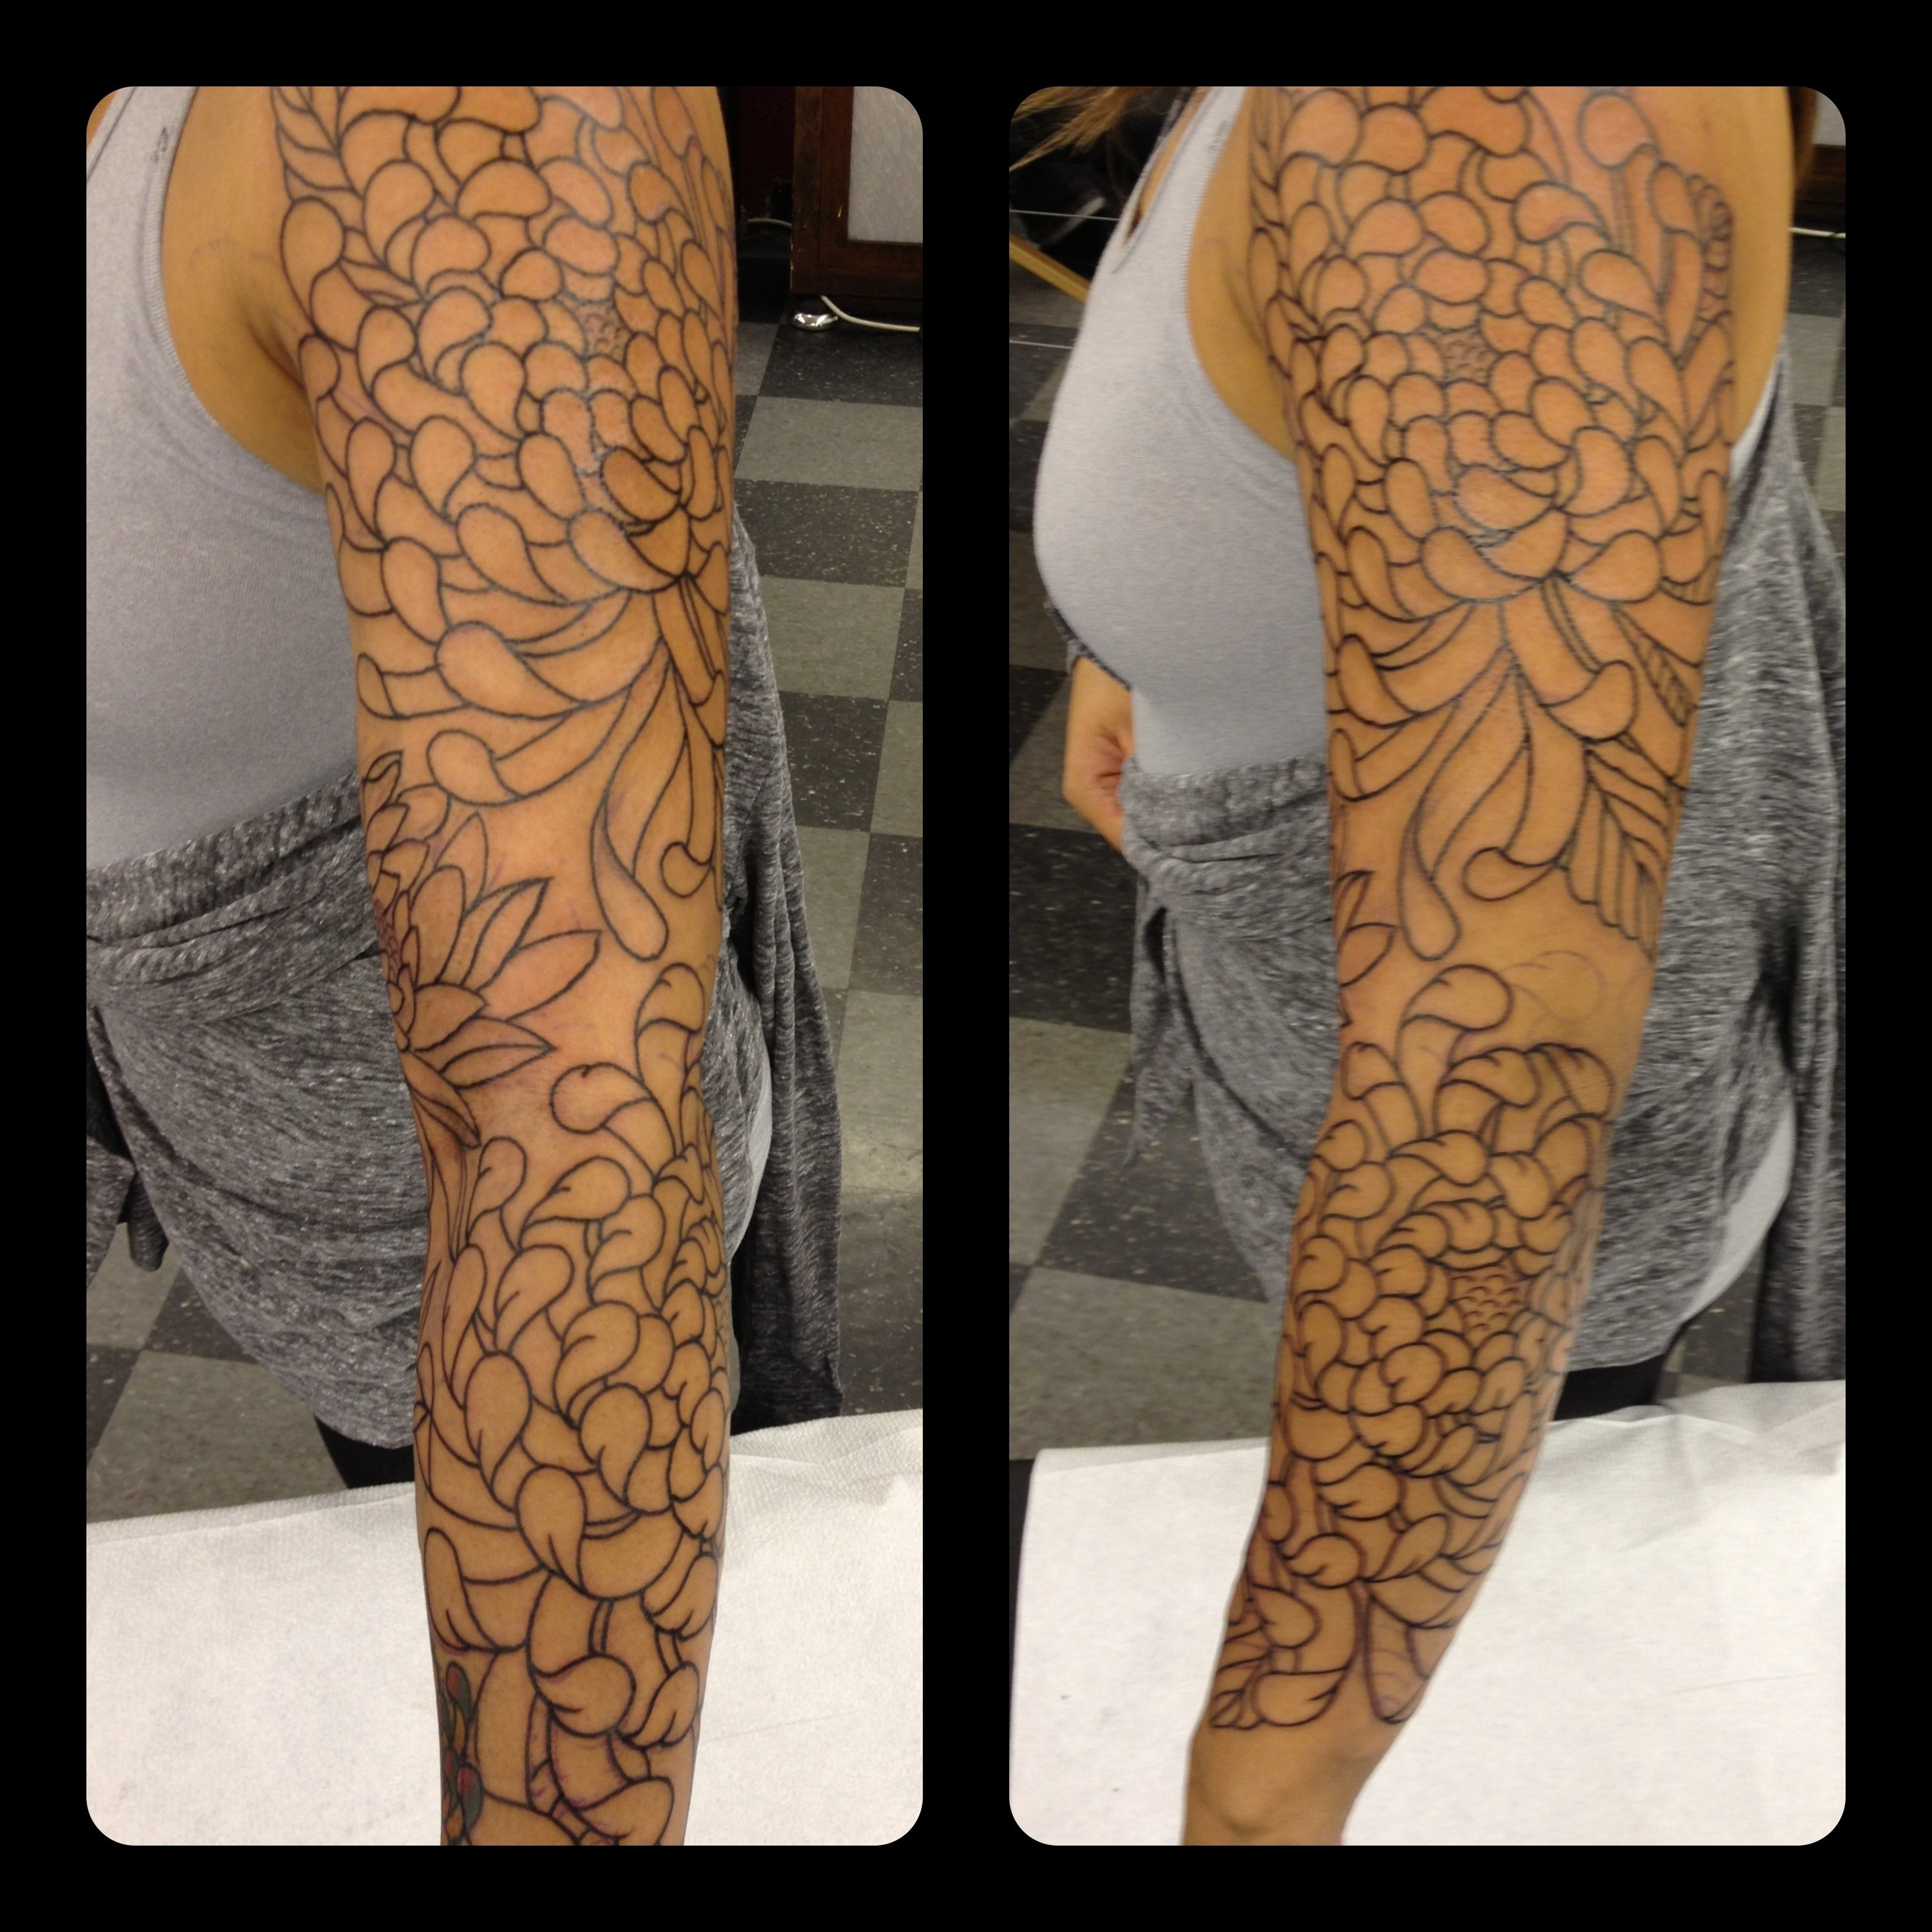 10 Stunning Fill In Tattoo Sleeve Ideas tattoo filler patterns related keywords tattoo filler patterns